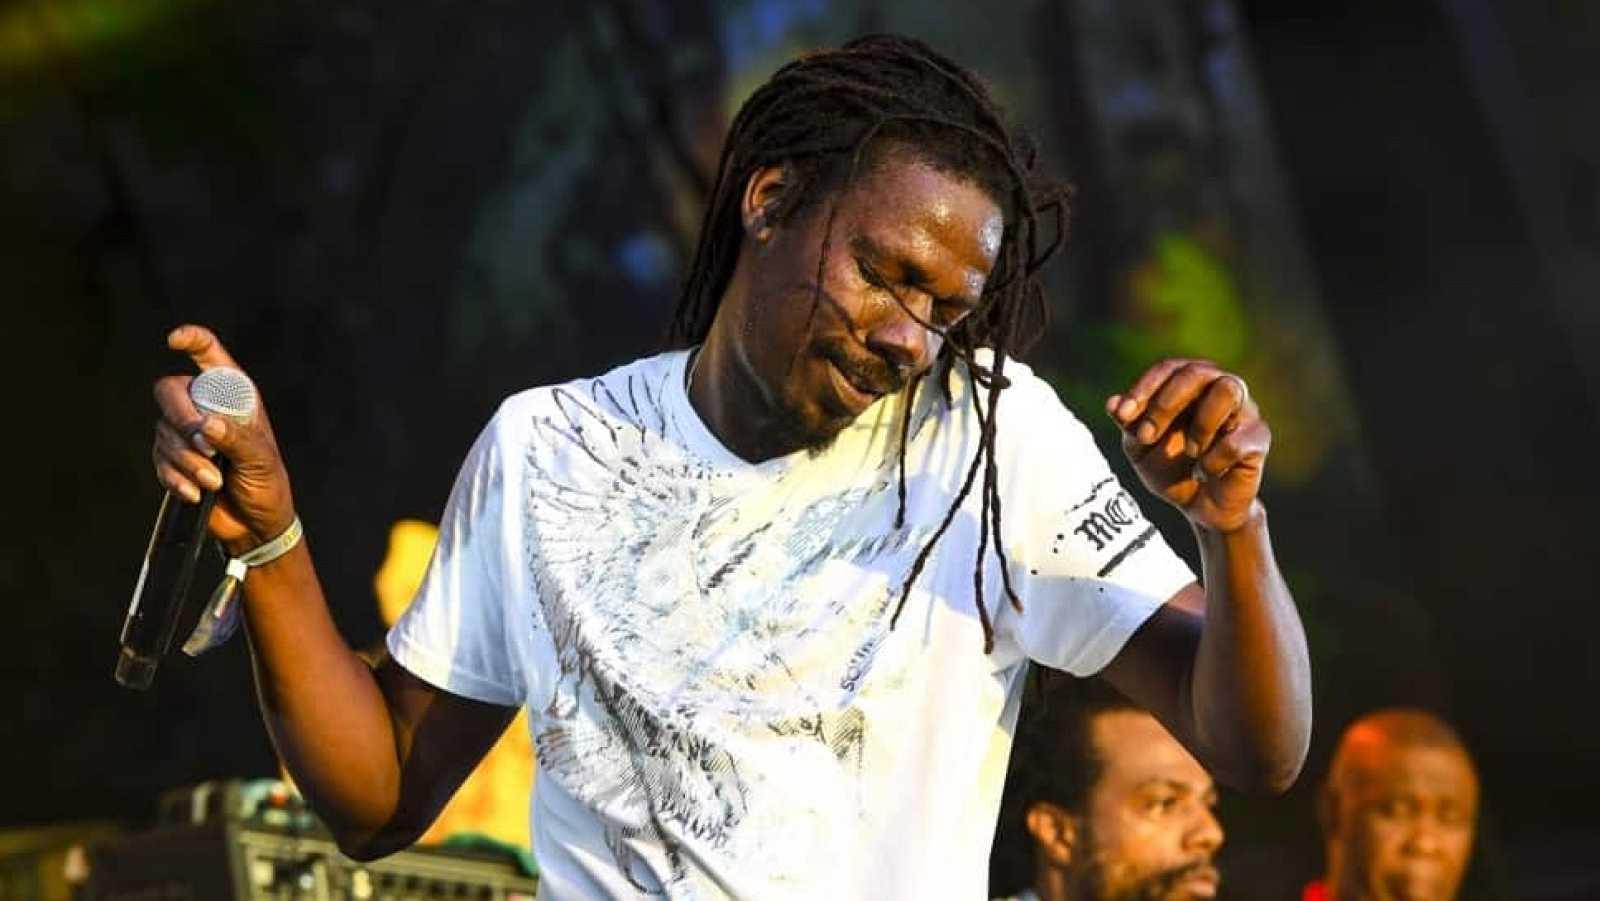 Festivales - Rototom 2019: Culture ft. Kenyatta Hill - 20/08/19 - Escuchar ahora